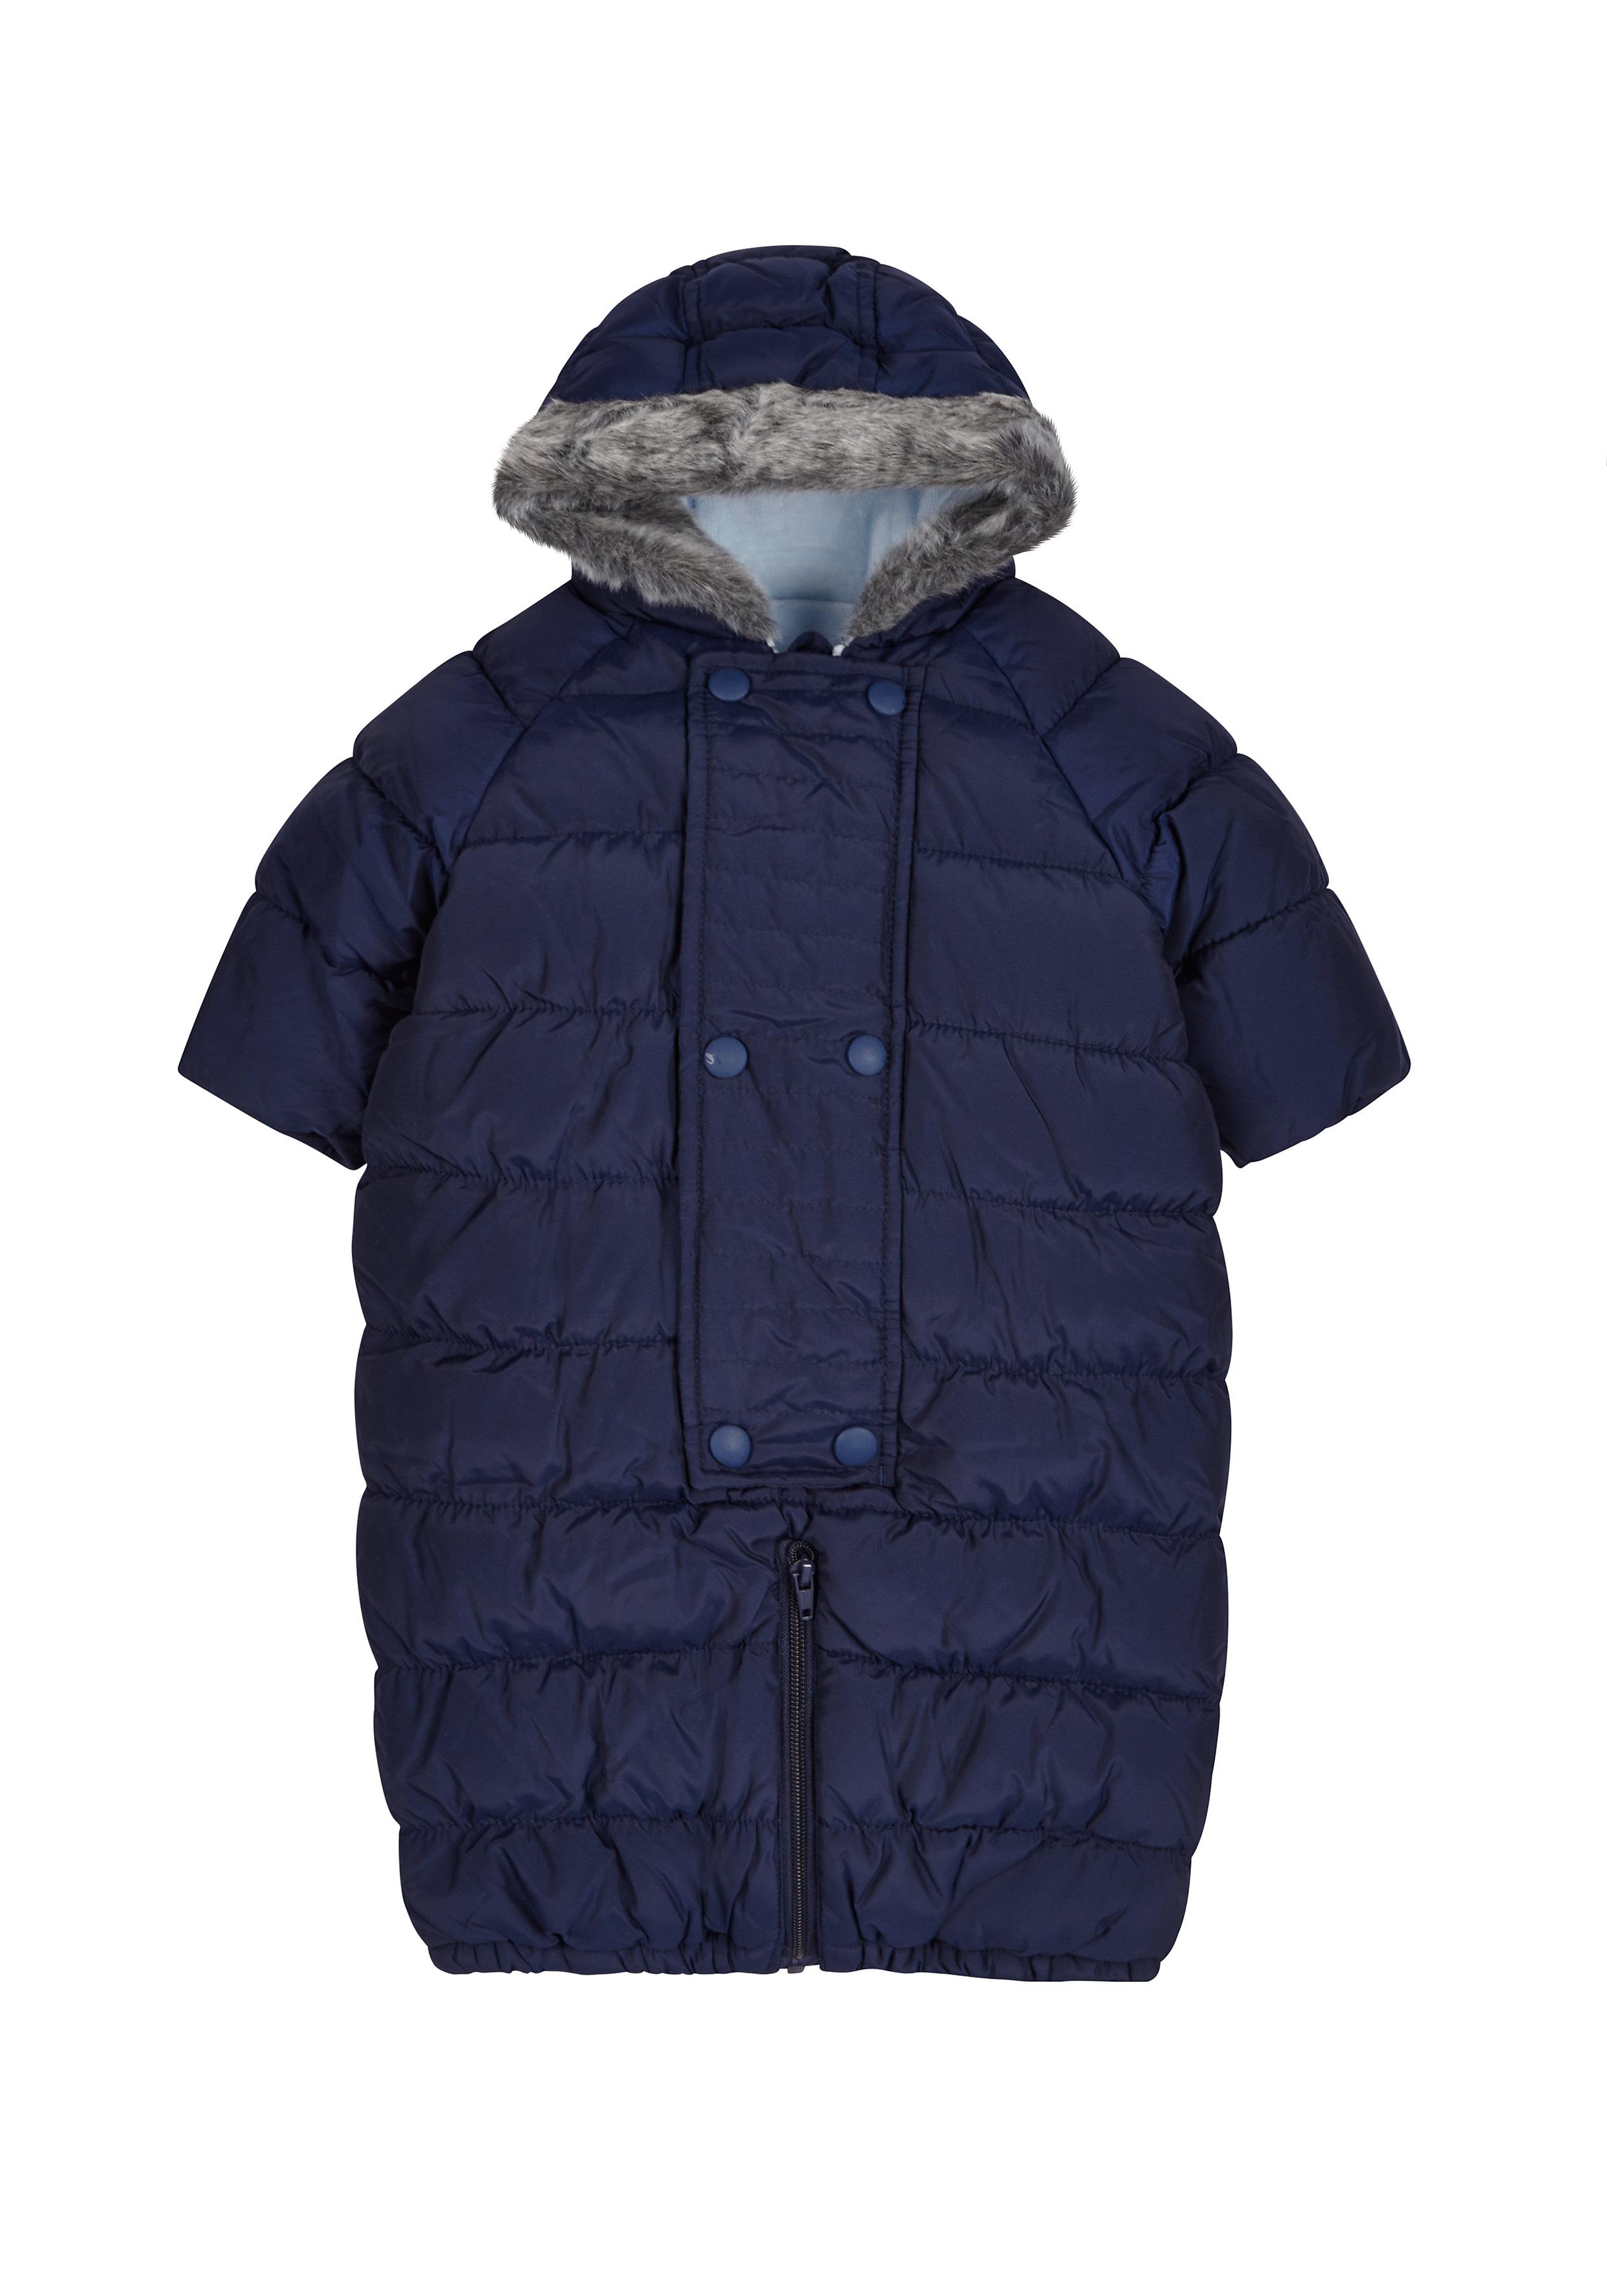 Mothercare | Boys Blue Converter Snowsuit - Navy